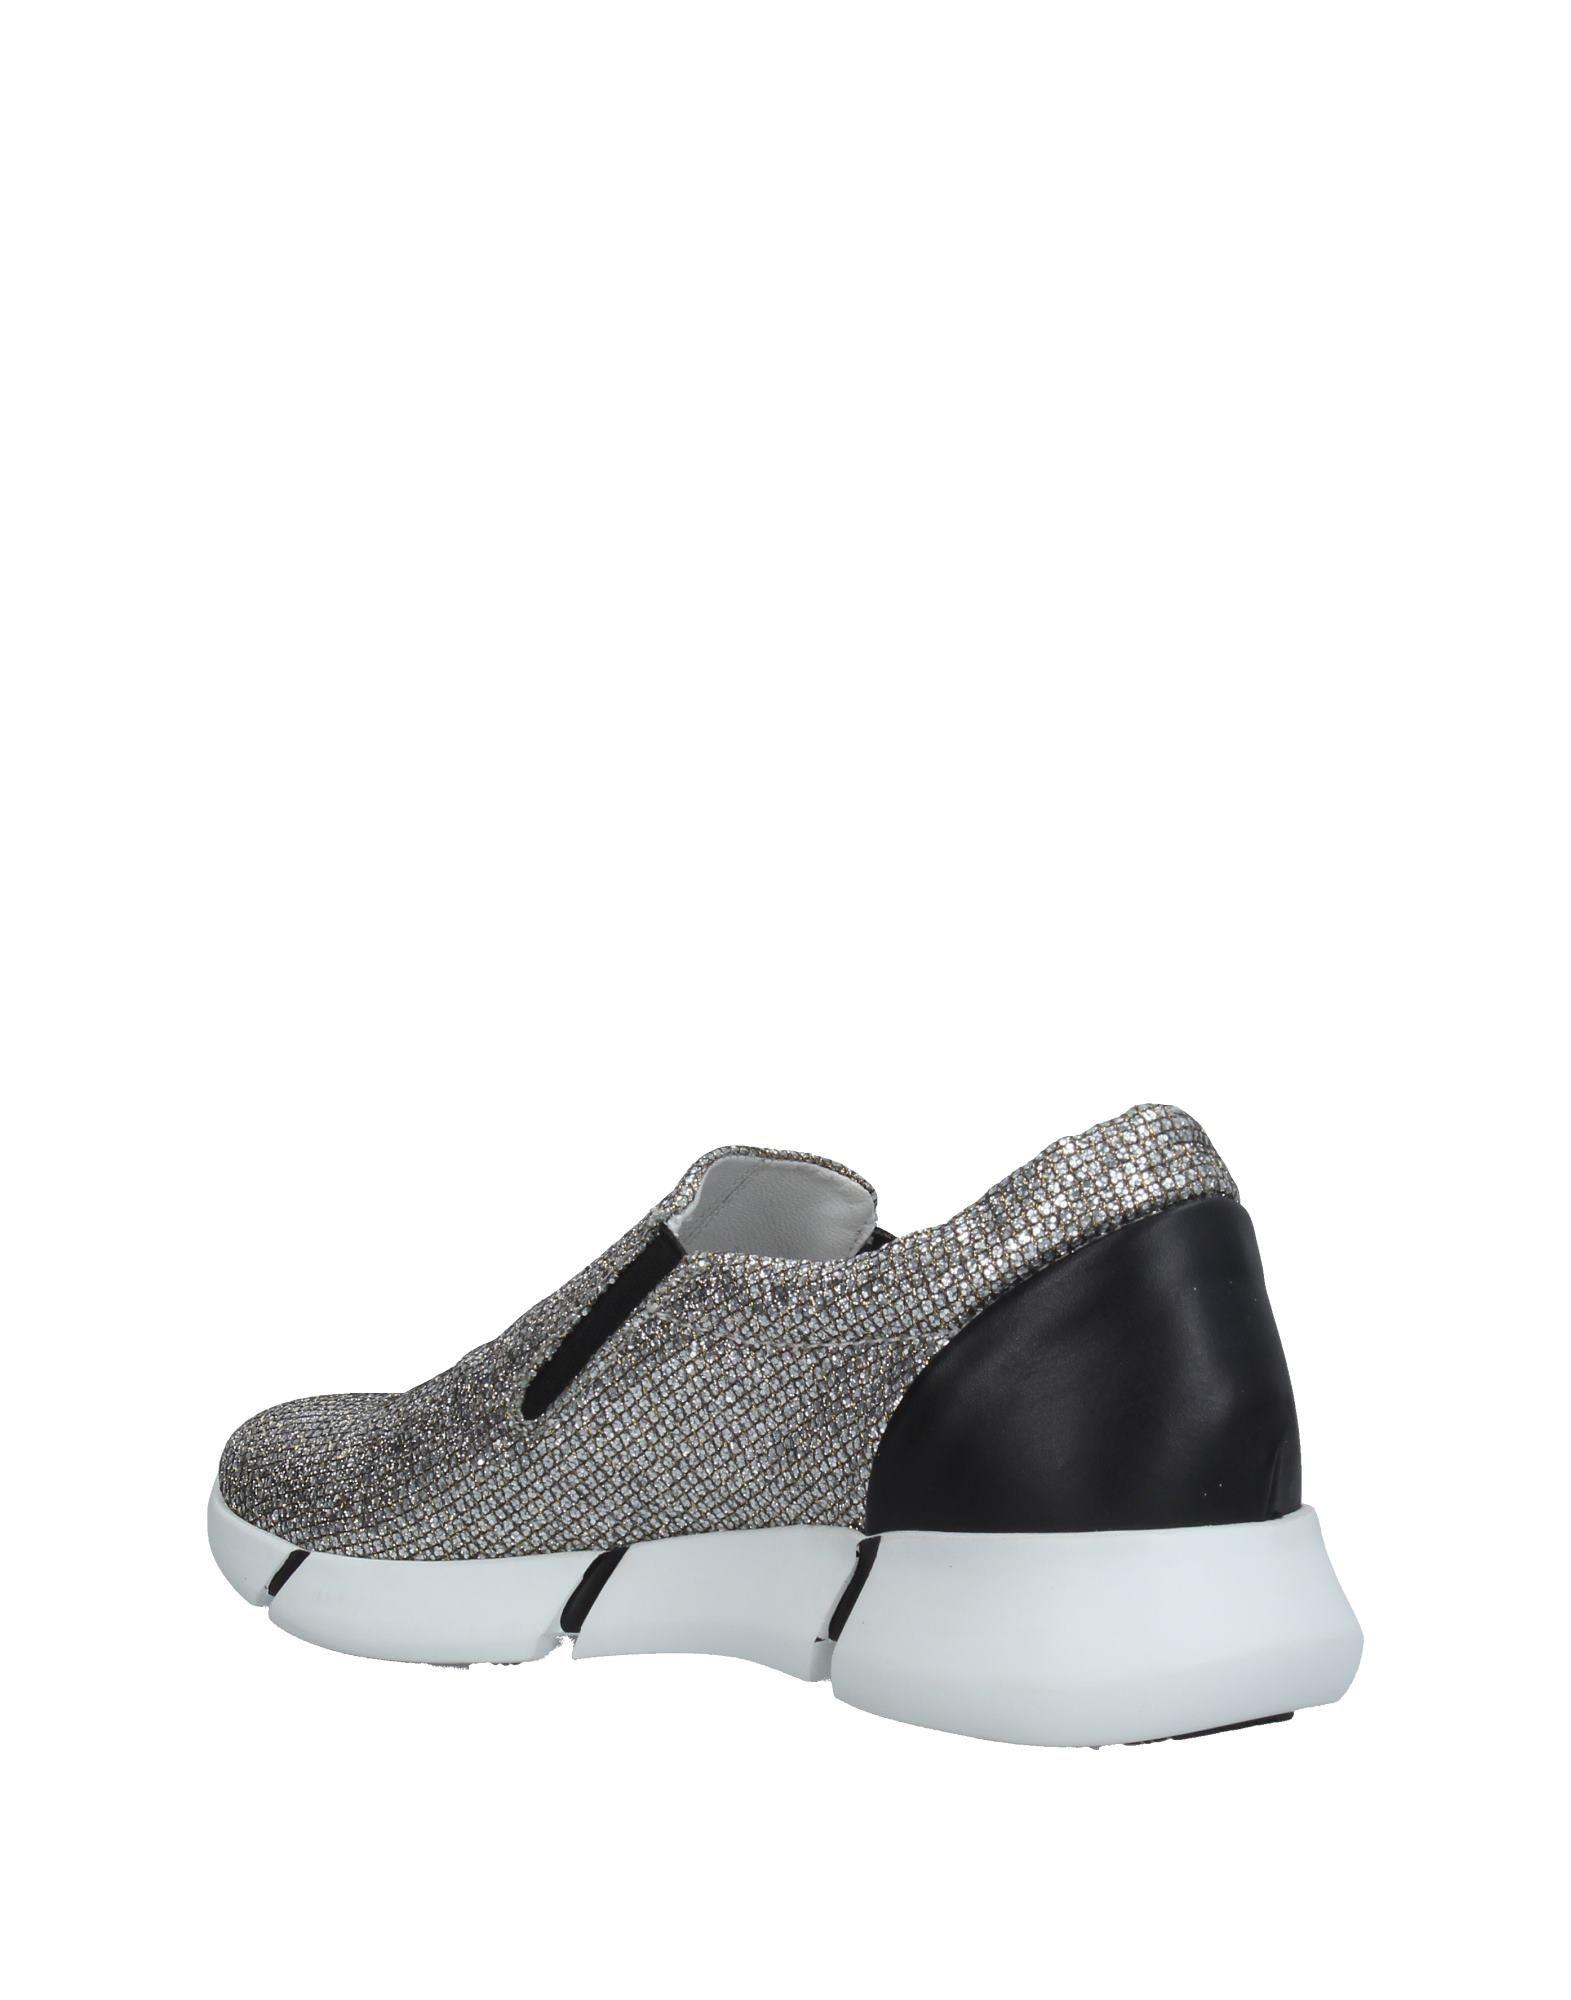 Elena Iachi Sneakers Damen  11274720CK Gute Qualität beliebte Schuhe